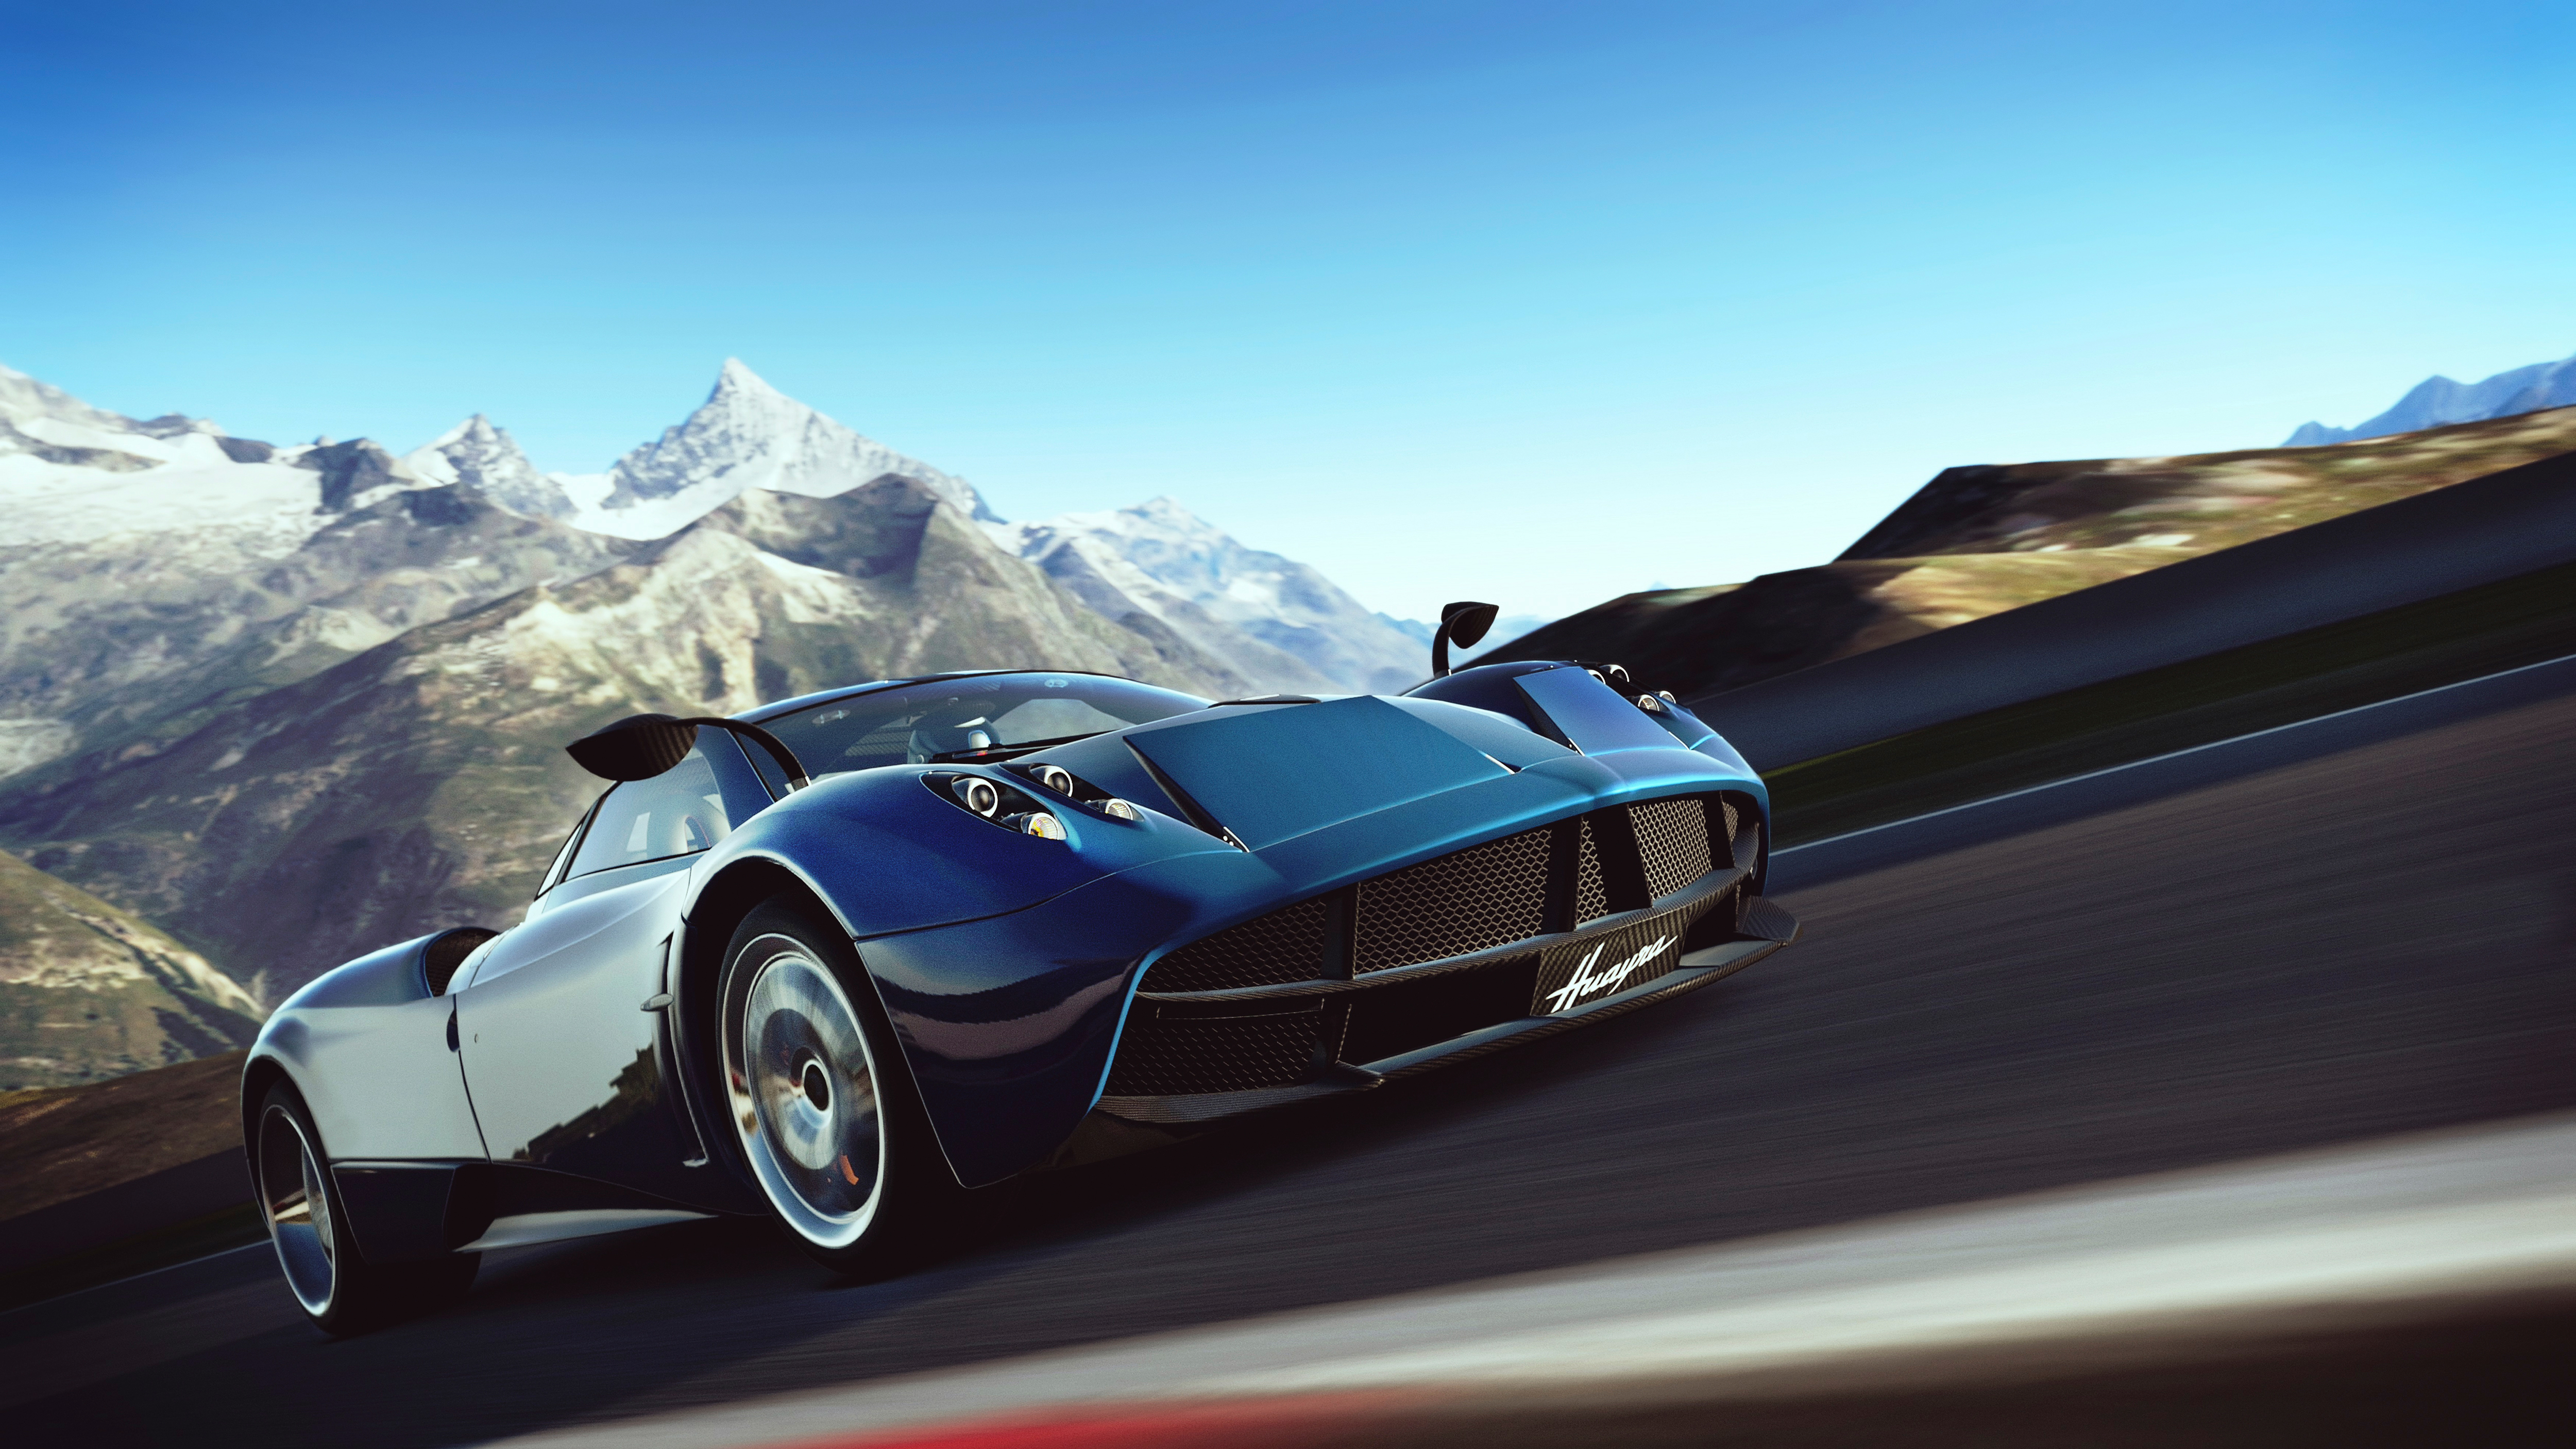 65389 download wallpaper Art, Cars, Speed, Gran Turismo-6, Car Simulator, Auto Simulator, Pagani Huayra screensavers and pictures for free